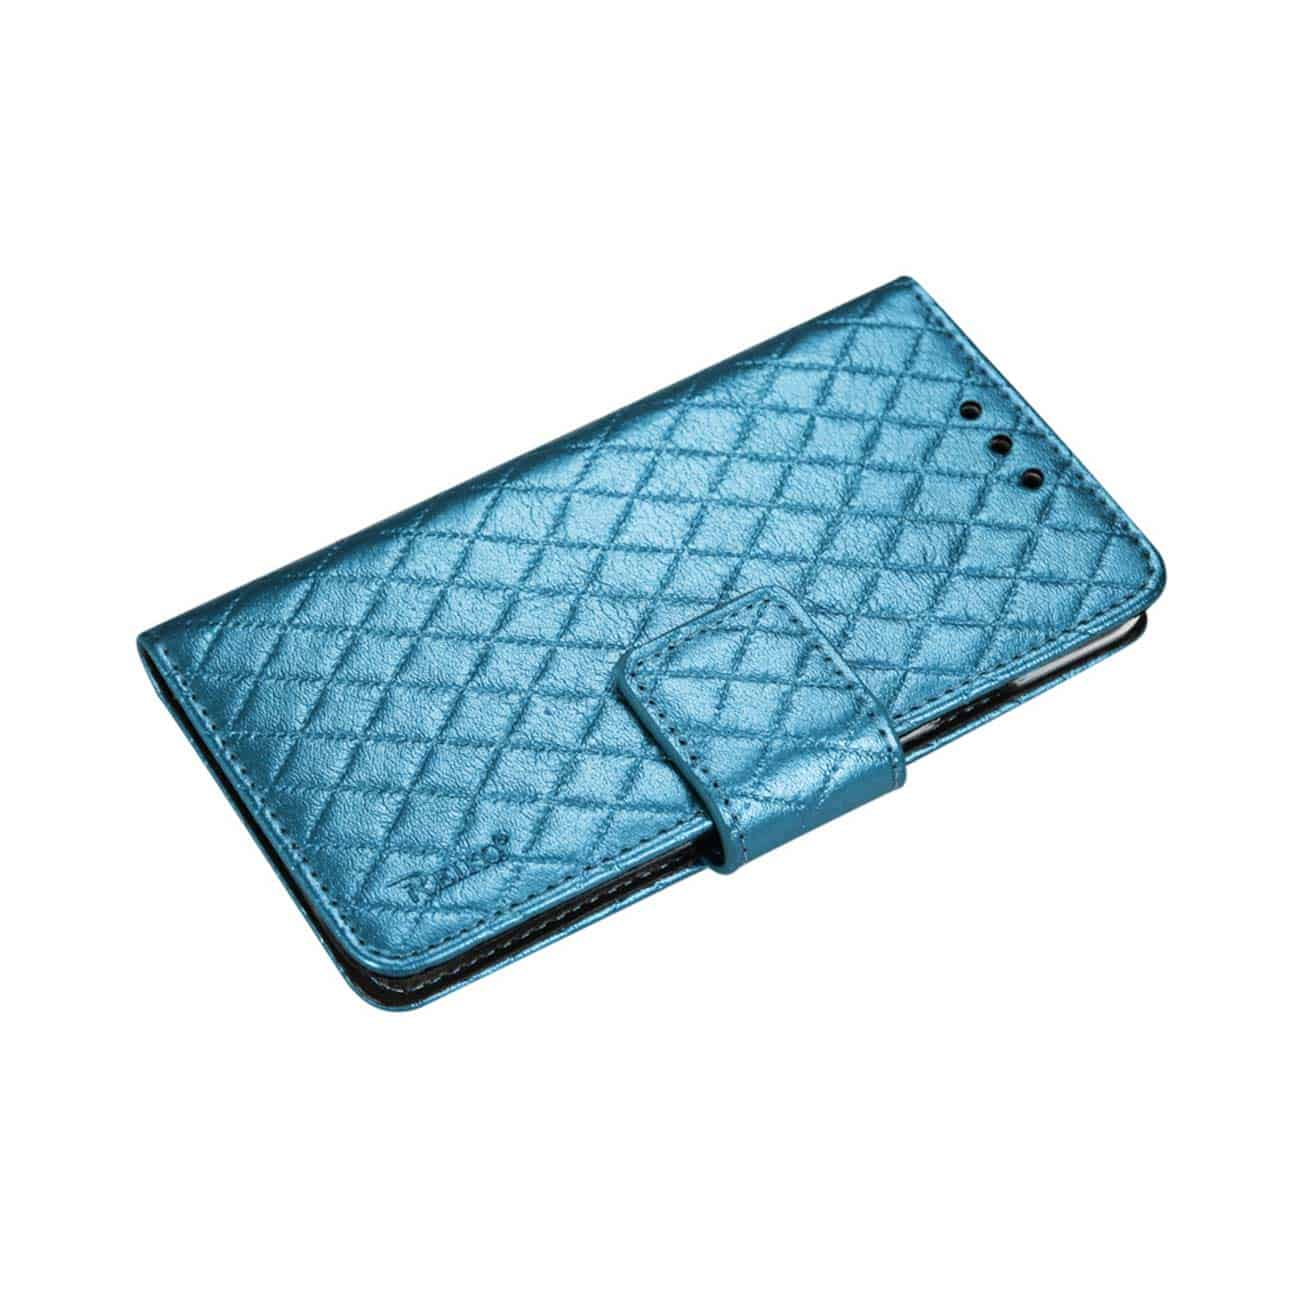 SAMSUNG GALAXY NOTE 4 RHOMBUS WALLET CASE IN BLUE